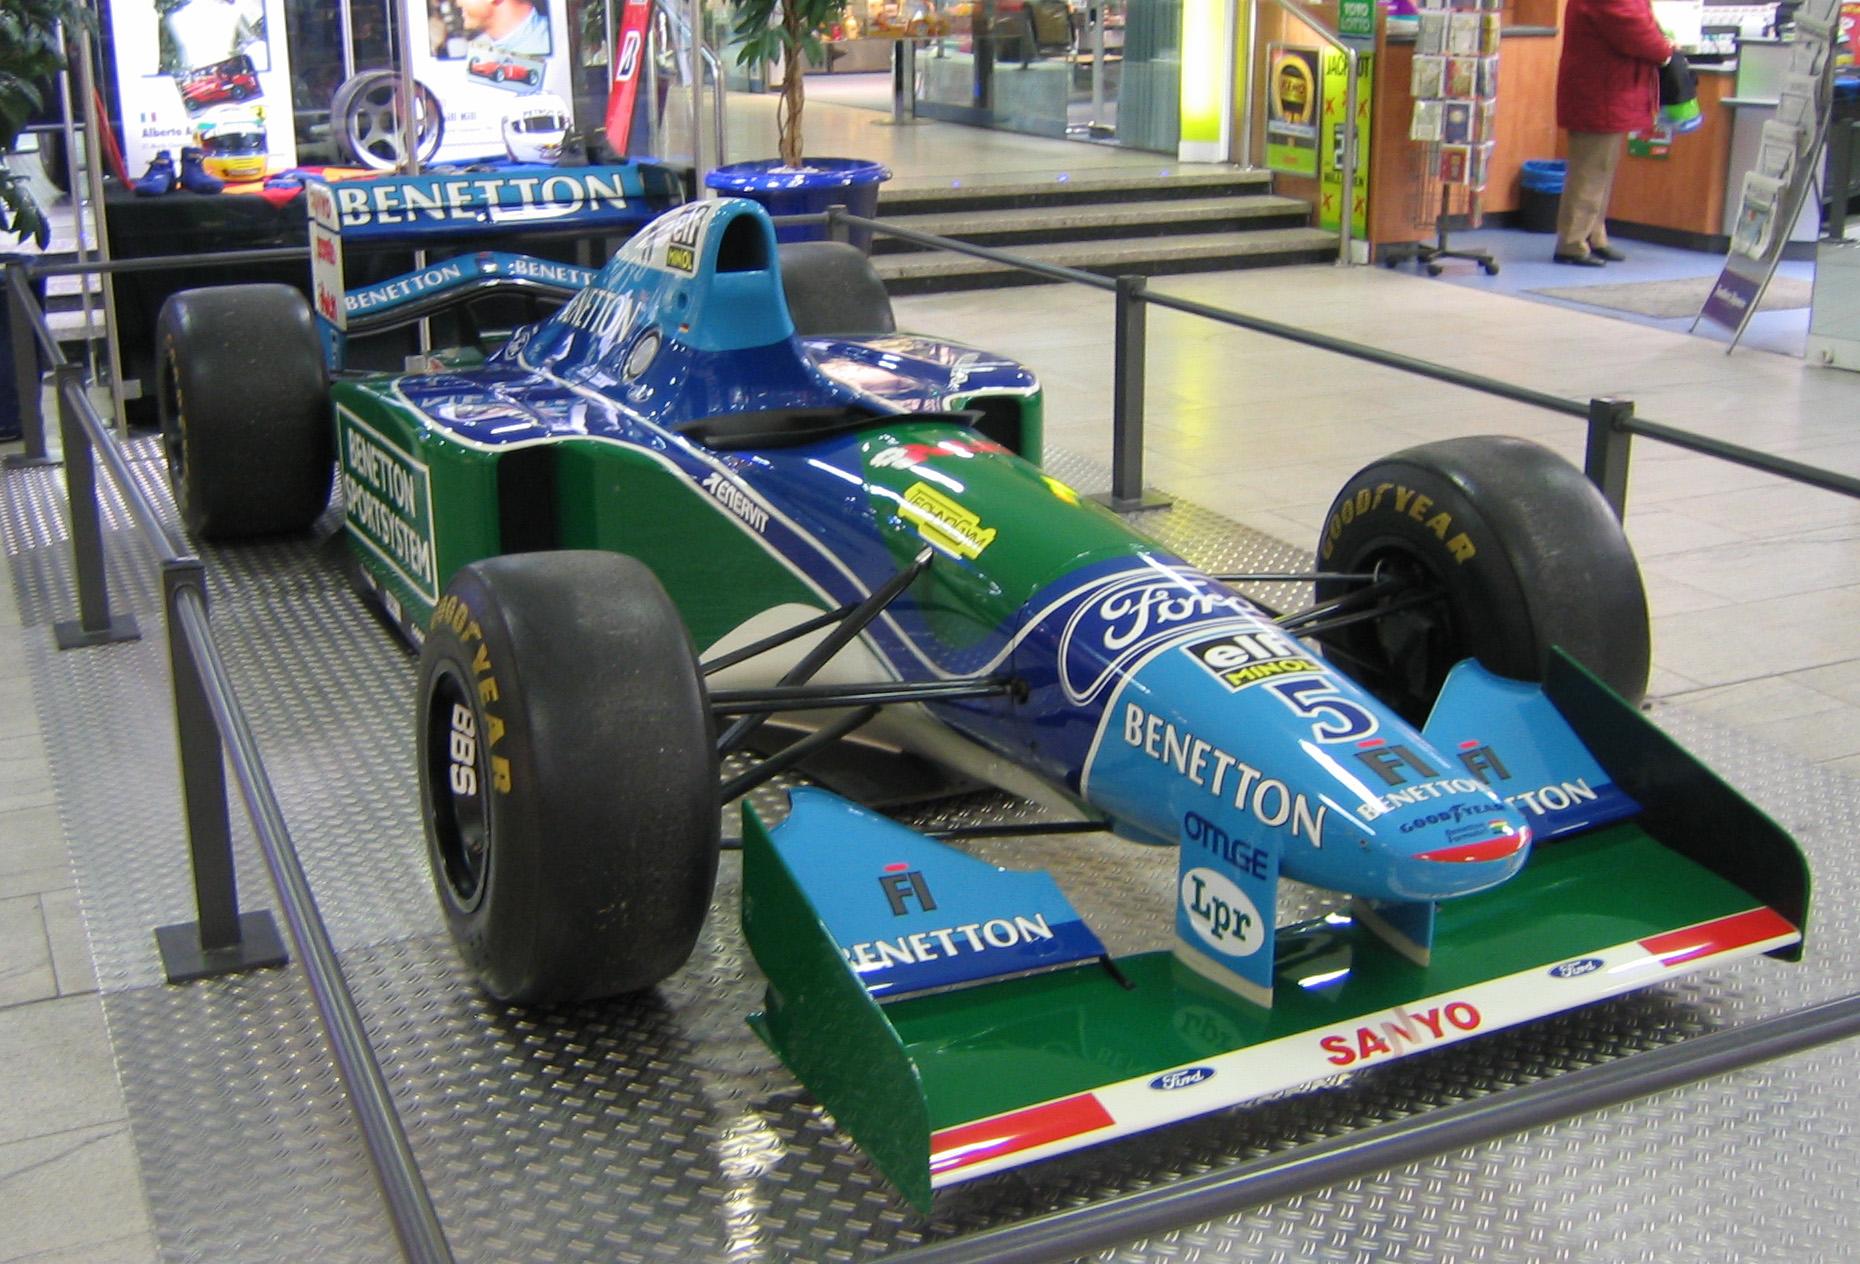 2 f1 retour French GP FORMULA 1 1994 Nigel Mansell Williams Renault fw16 No